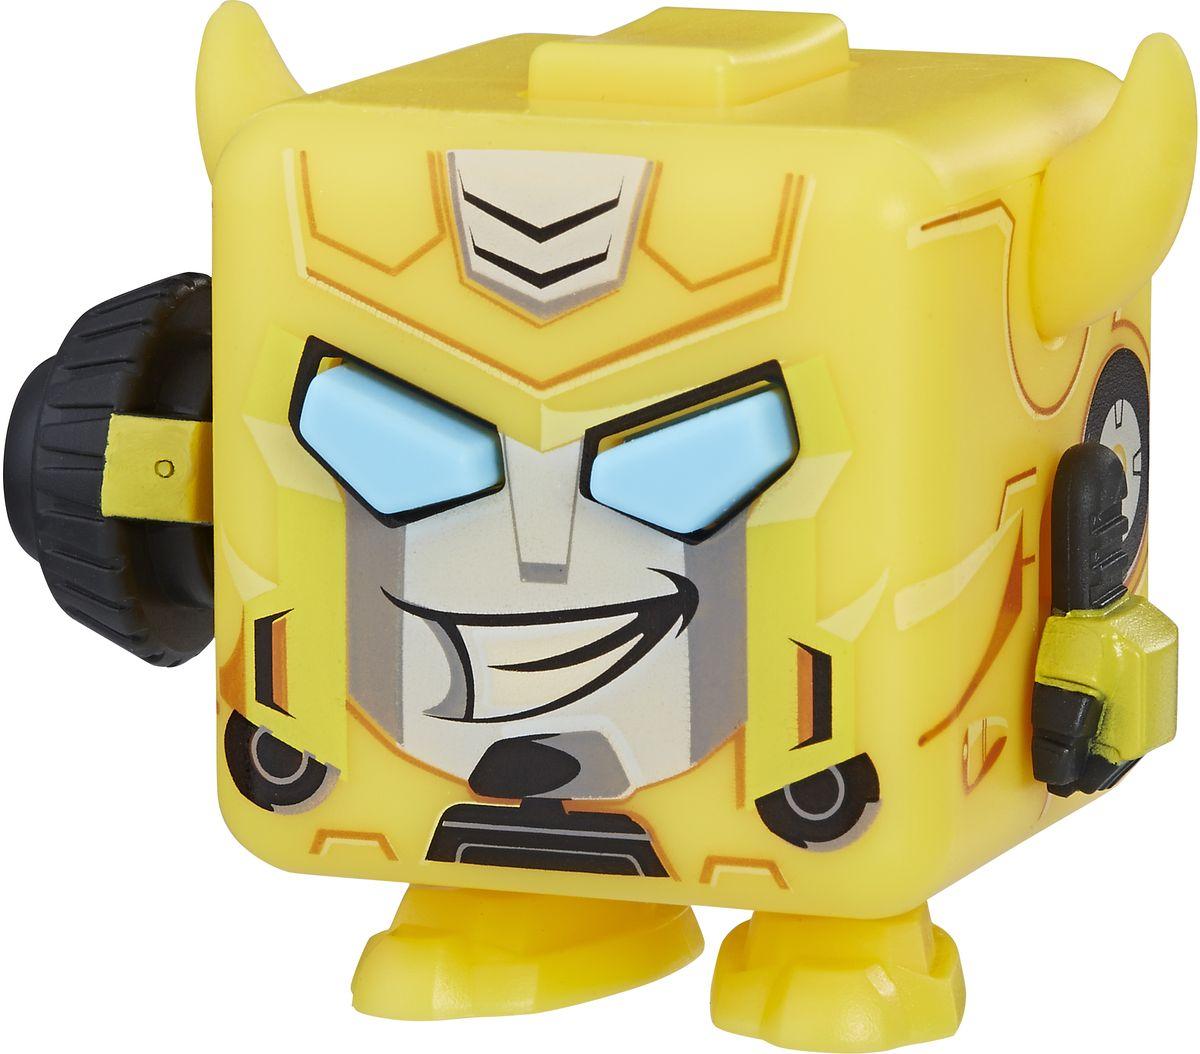 Fidget Its Антистрессовая игрушка Кубик Transformers Bumblebee transformers bumblebee and grindor